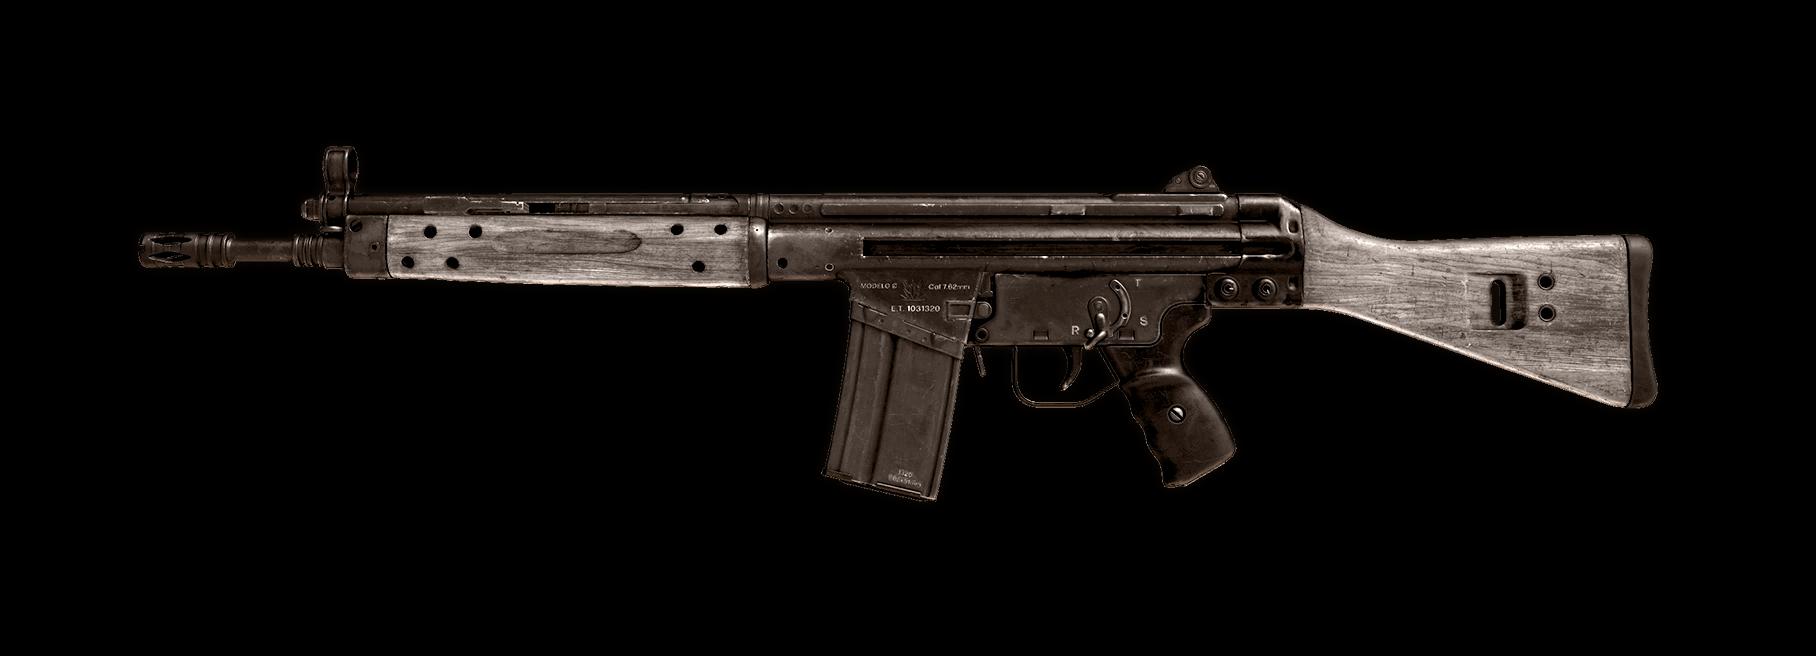 Image of C58